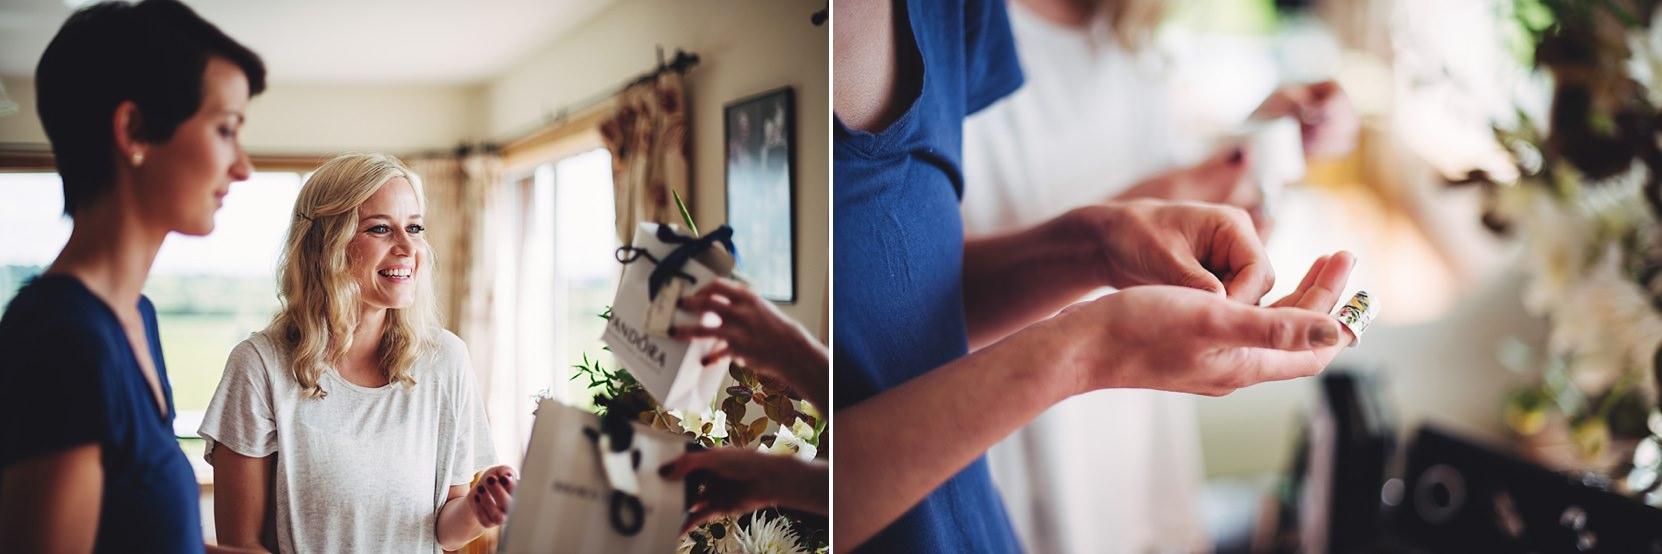 DIY-Wedding-_0056